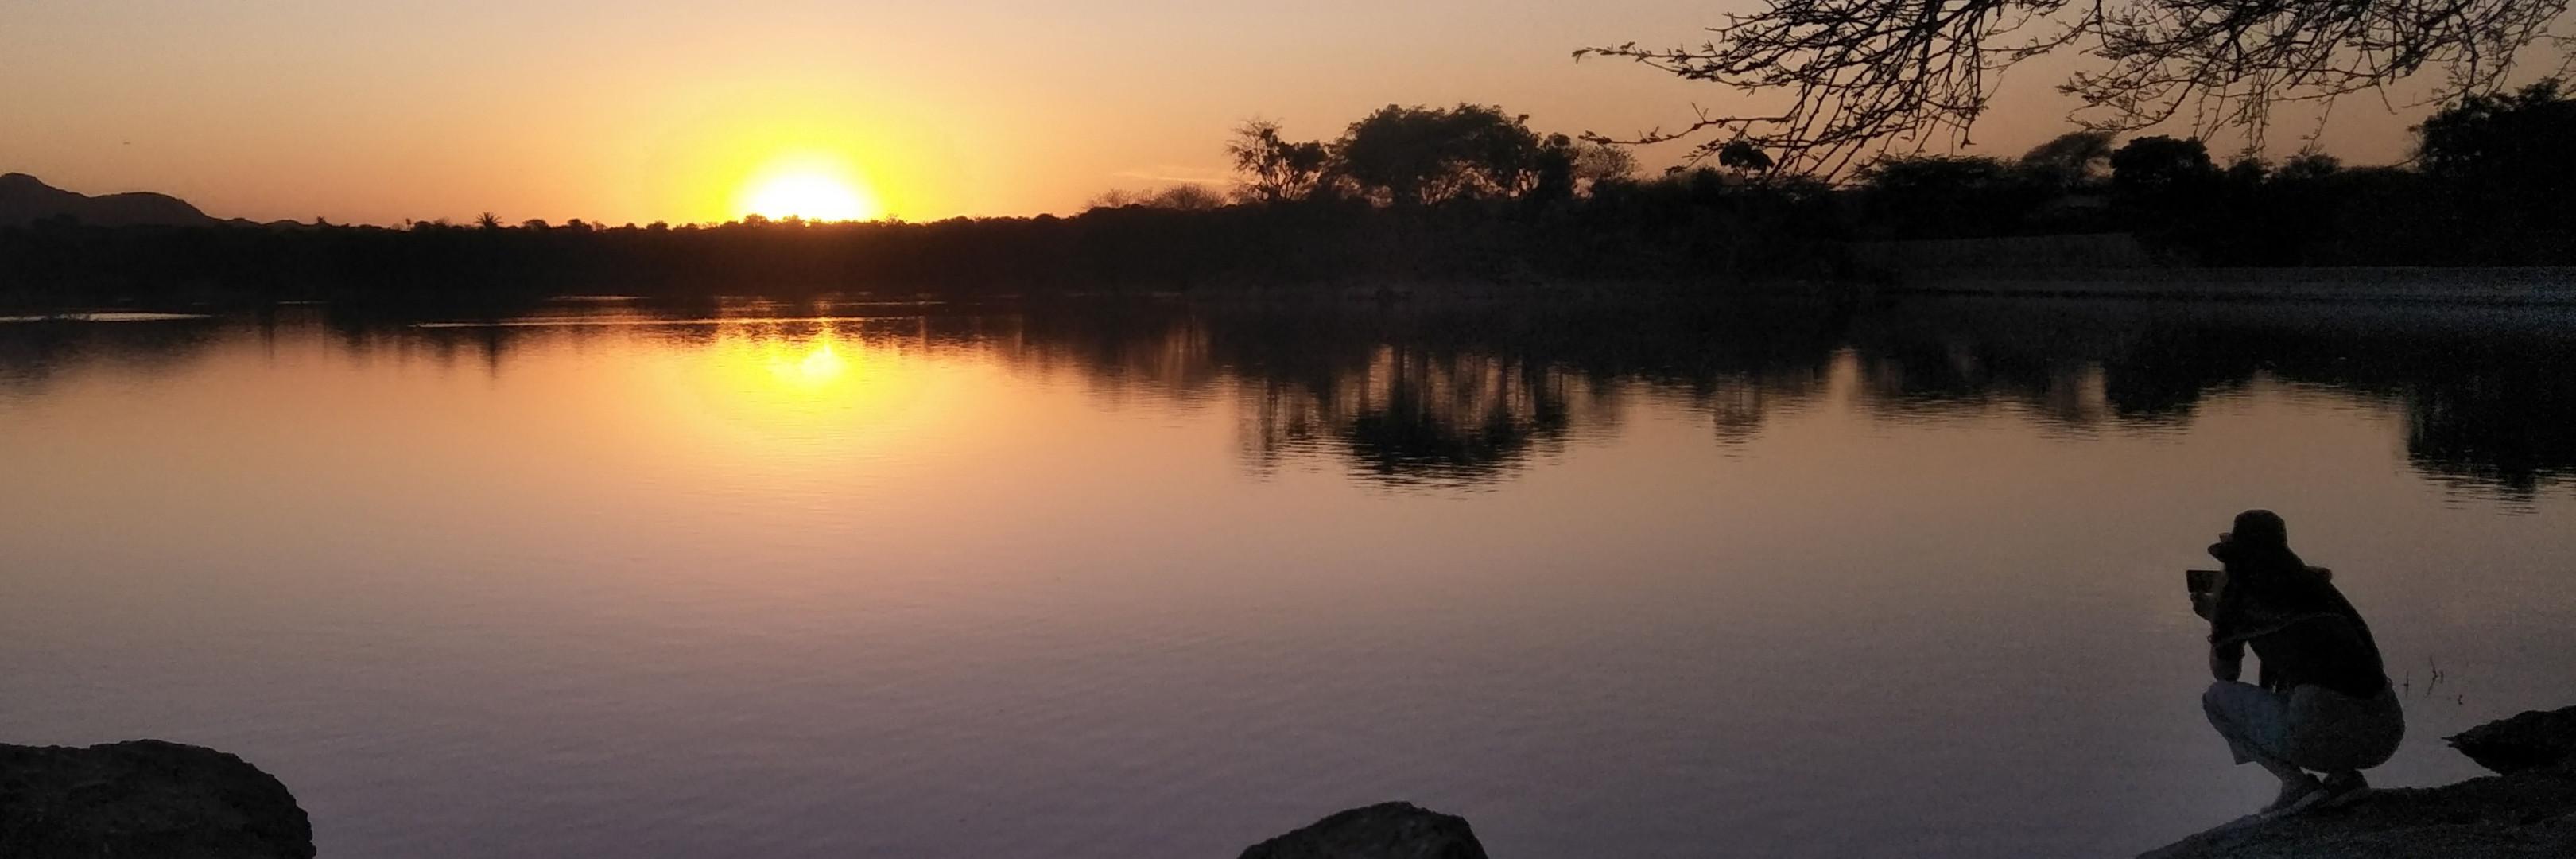 barabagh deogarh_scenic lake view.jpg